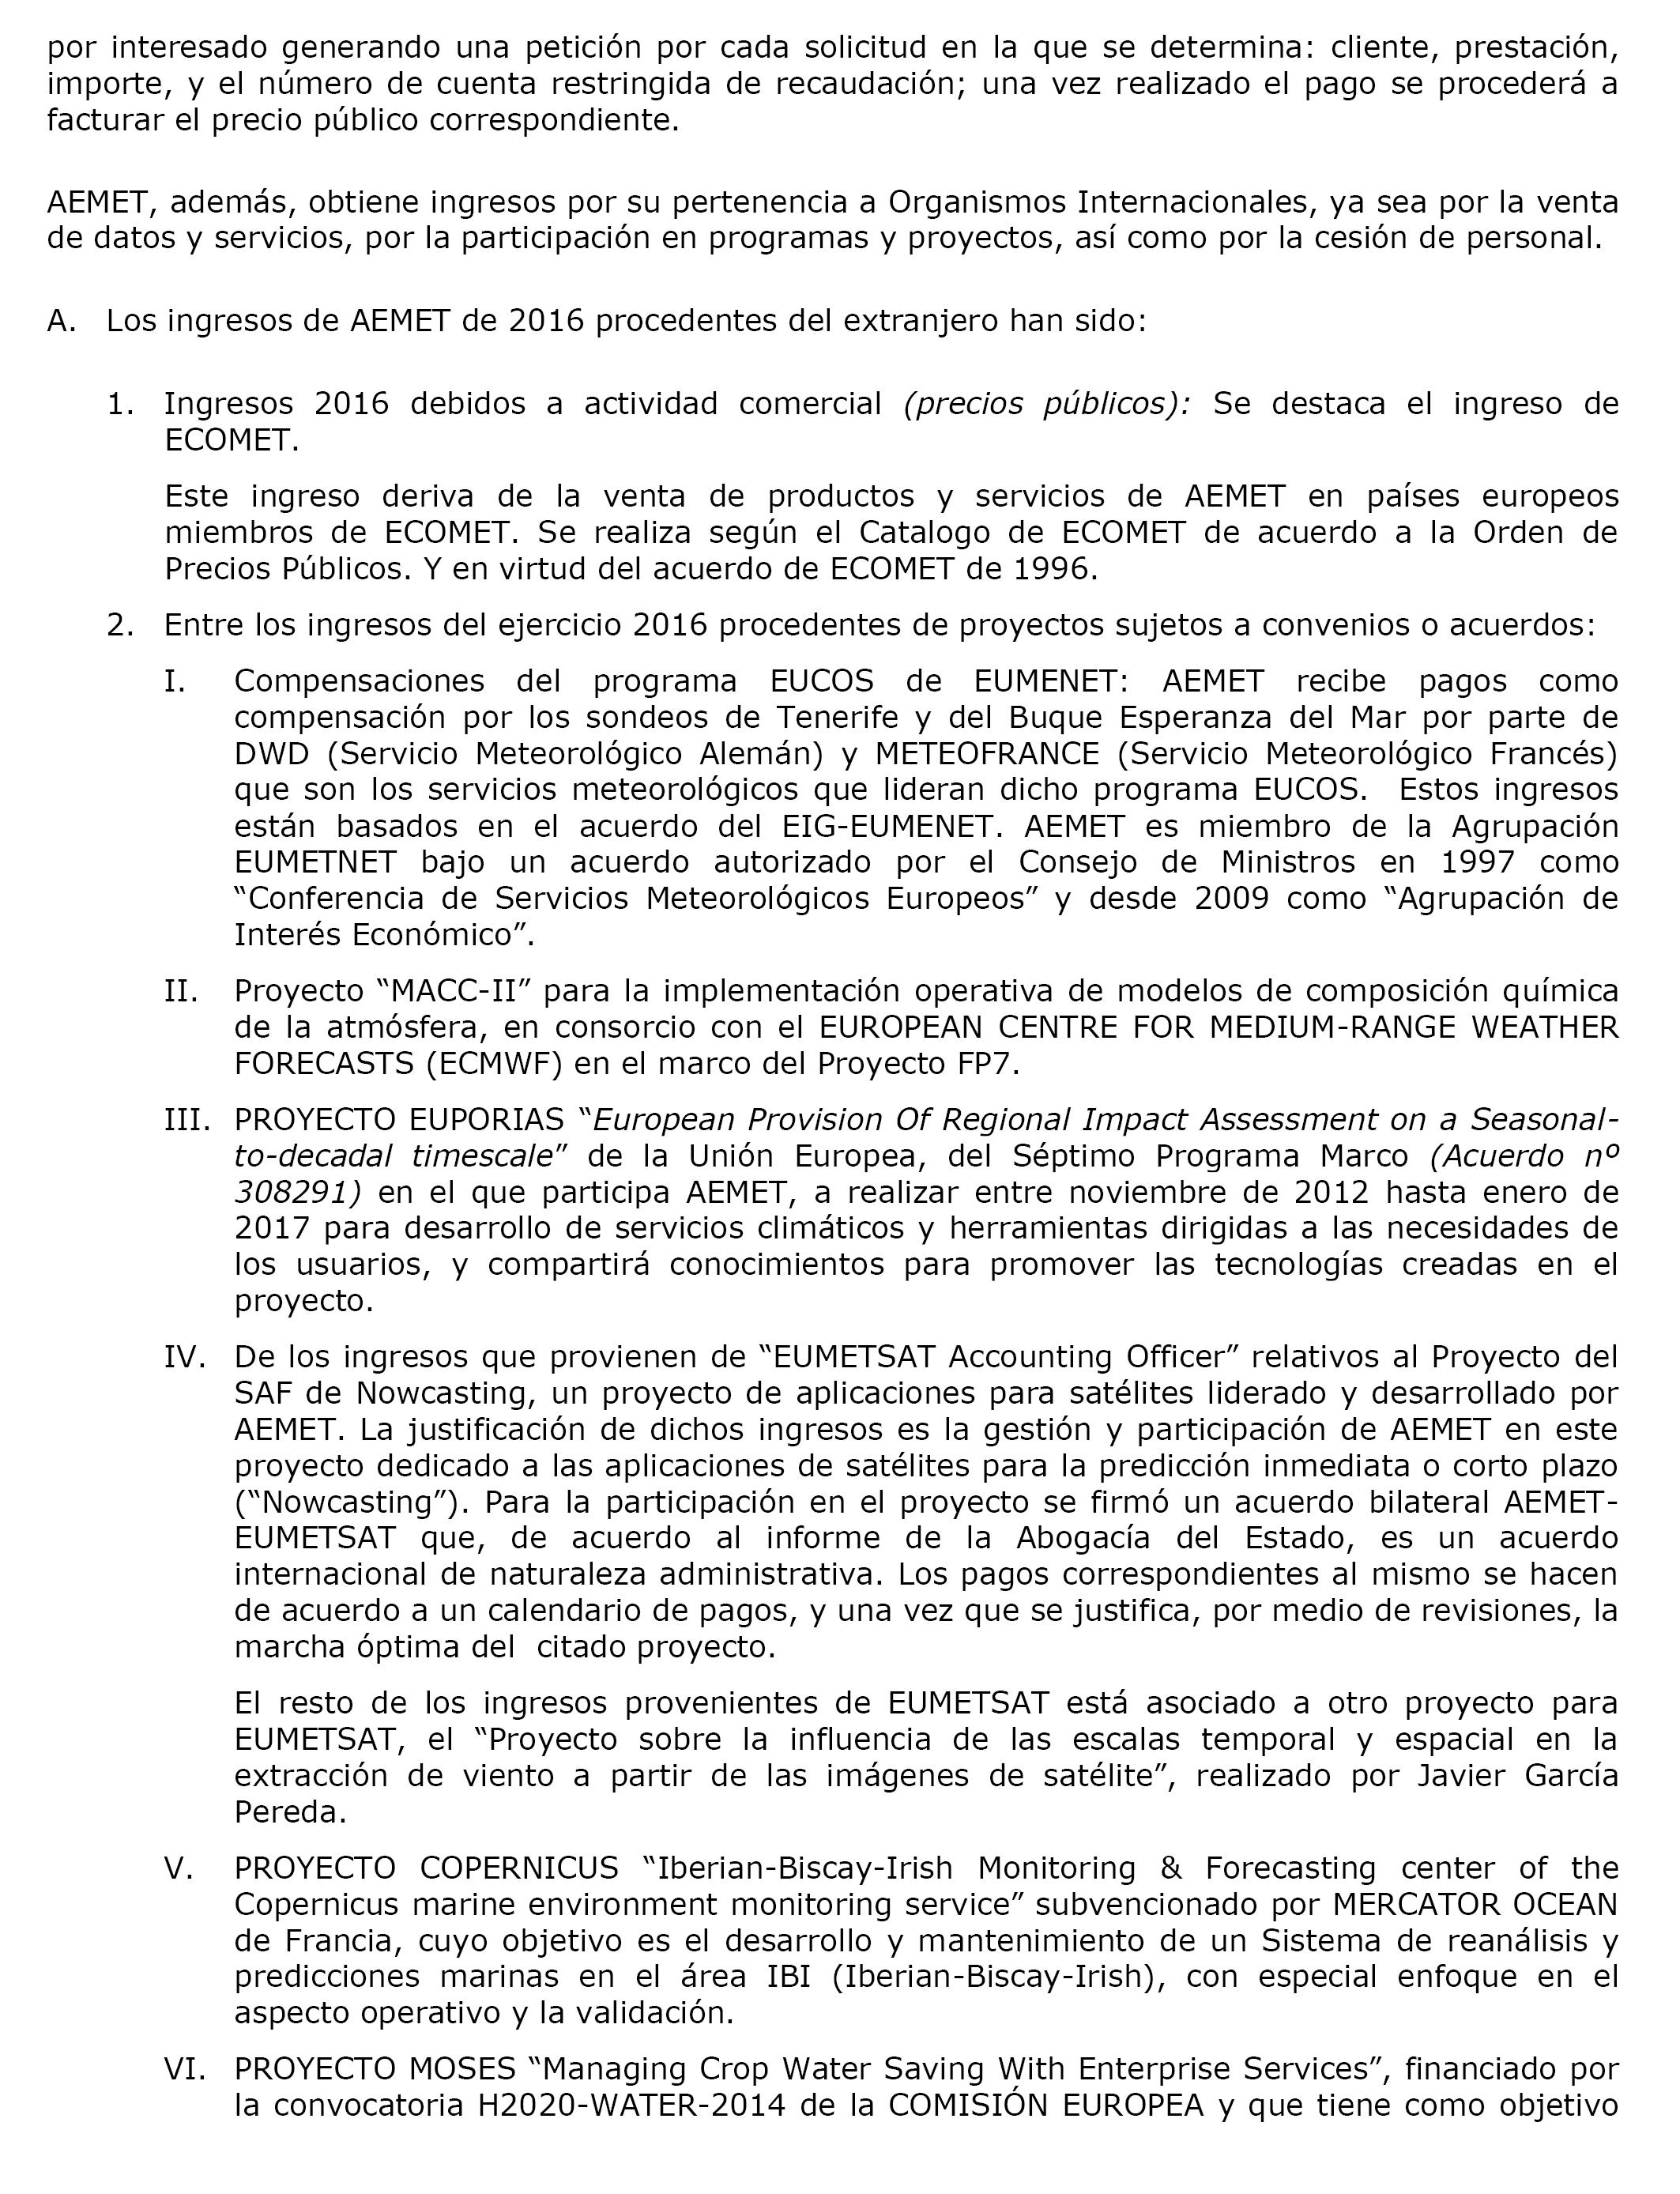 BOE.es - Documento BOE-A-2017-10187